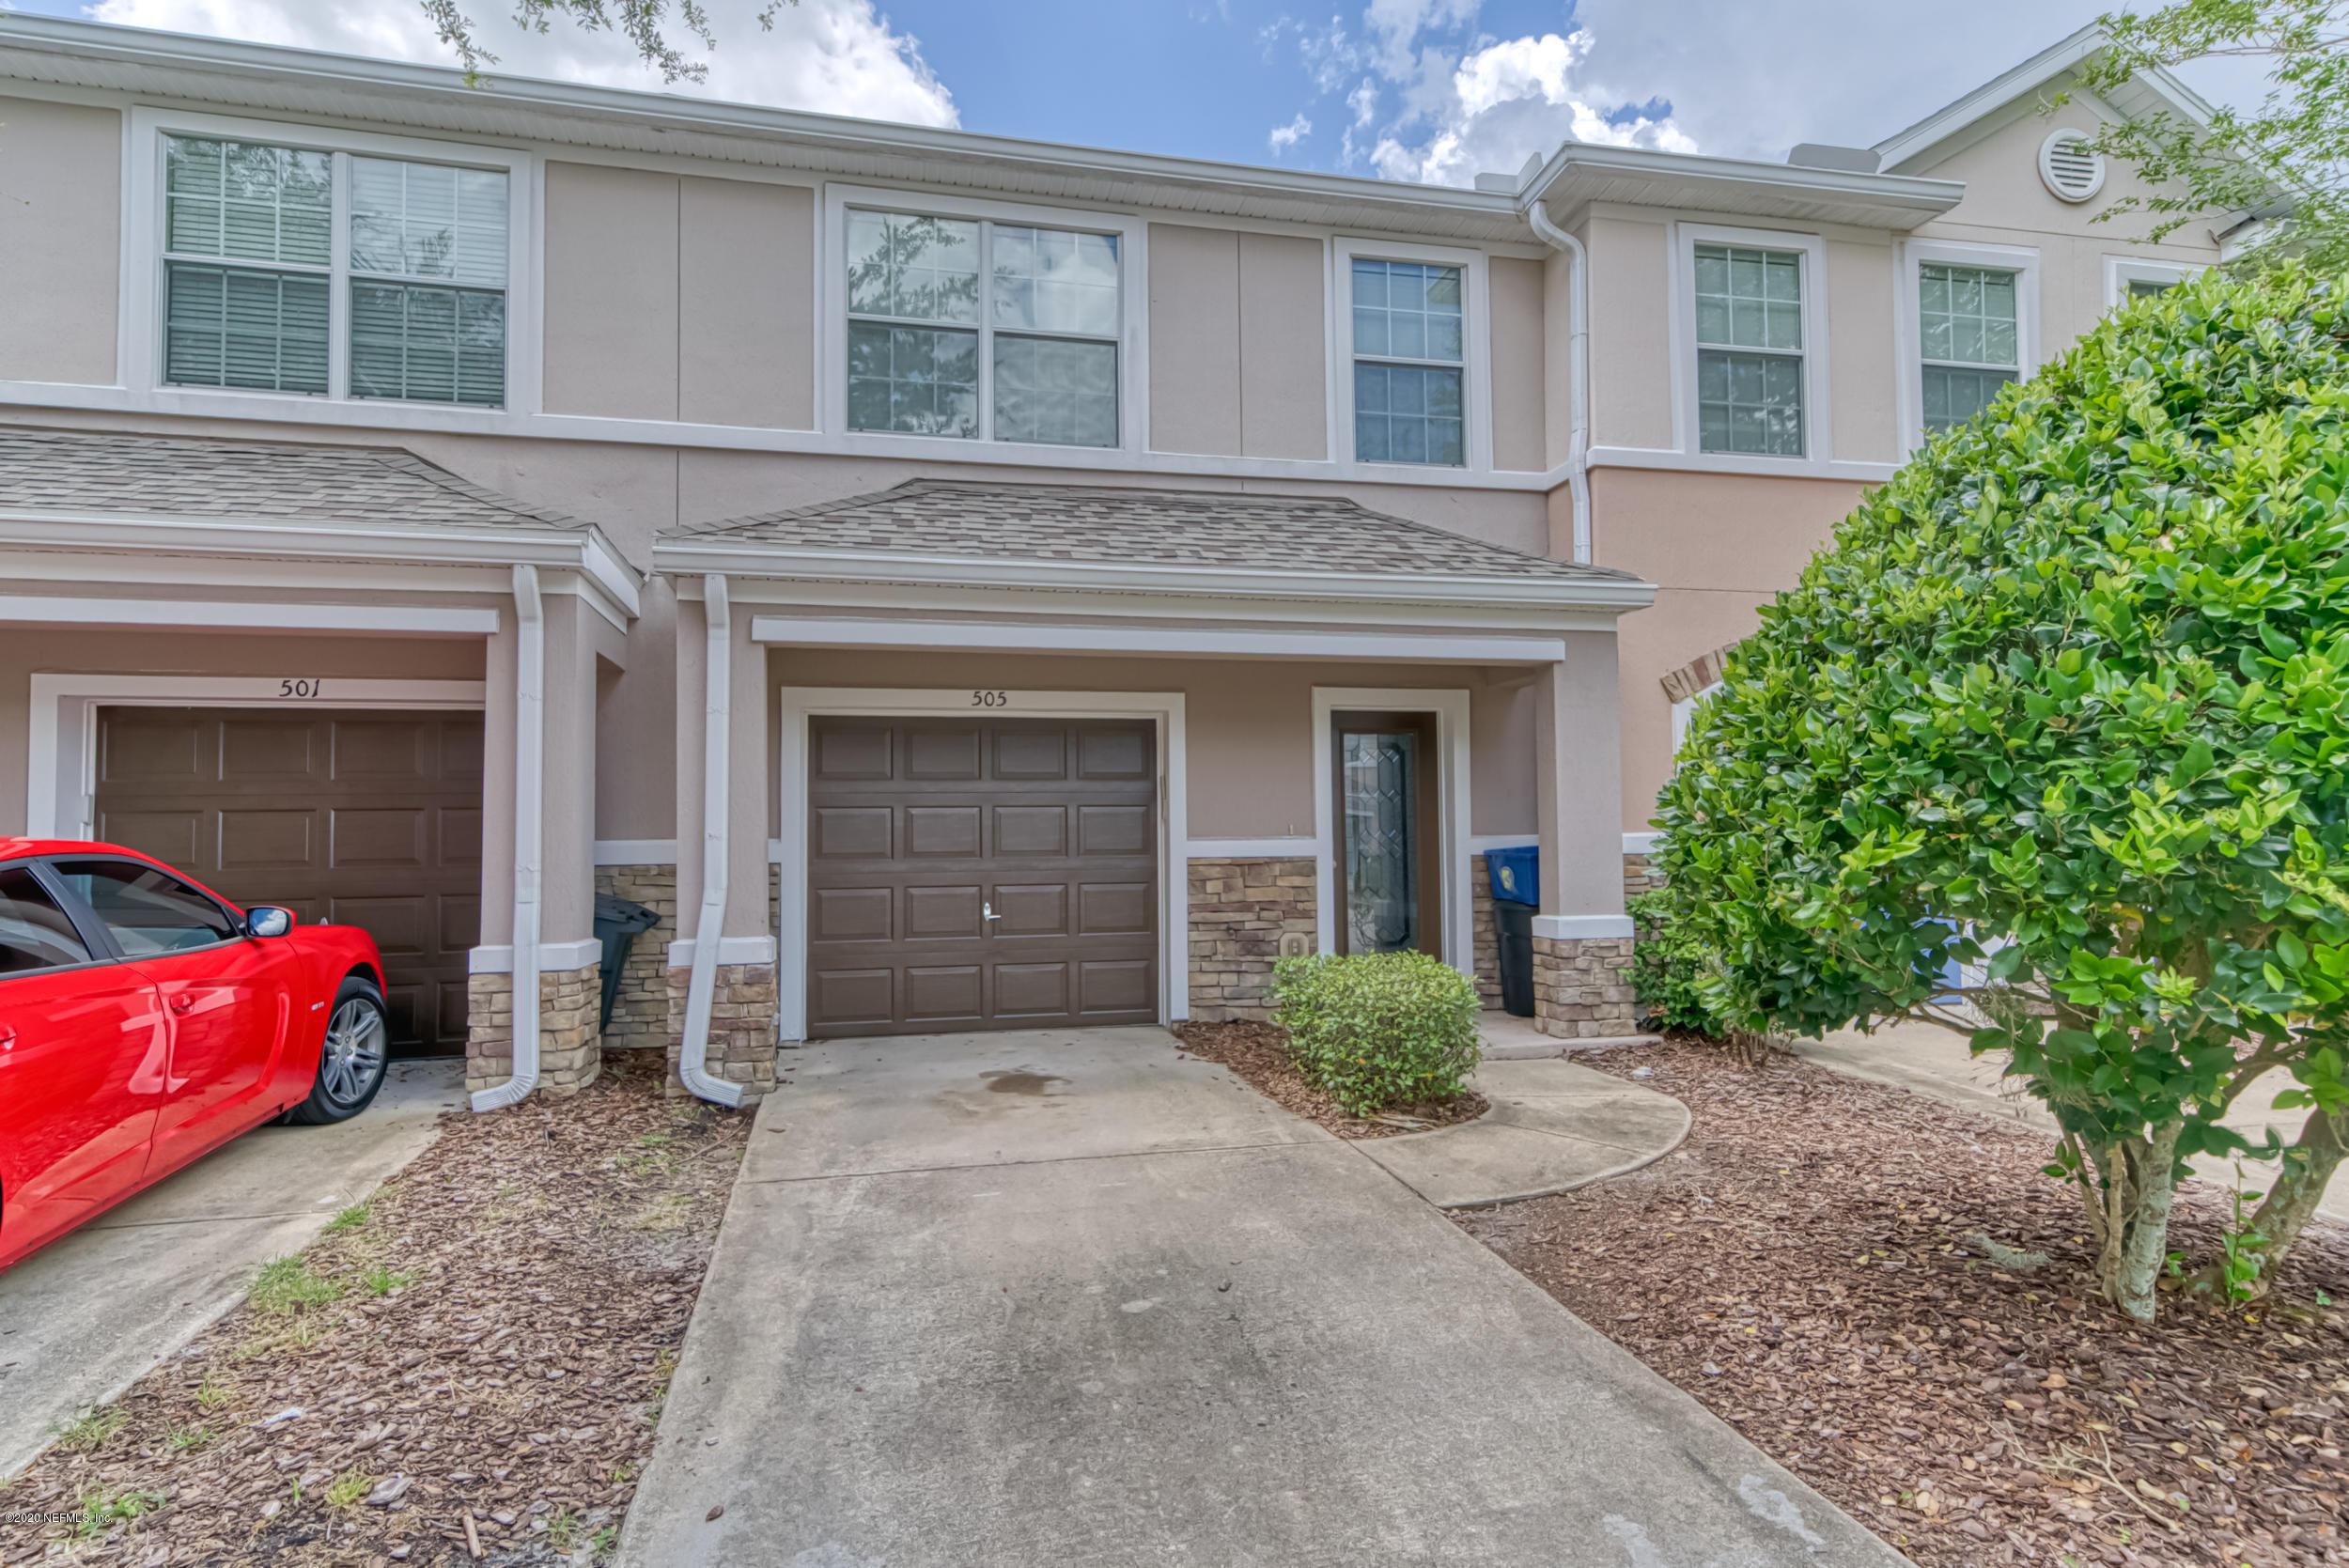 505 SUNSTONE, ORANGE PARK, FLORIDA 32065, 3 Bedrooms Bedrooms, ,2 BathroomsBathrooms,Residential,For sale,SUNSTONE,1061221